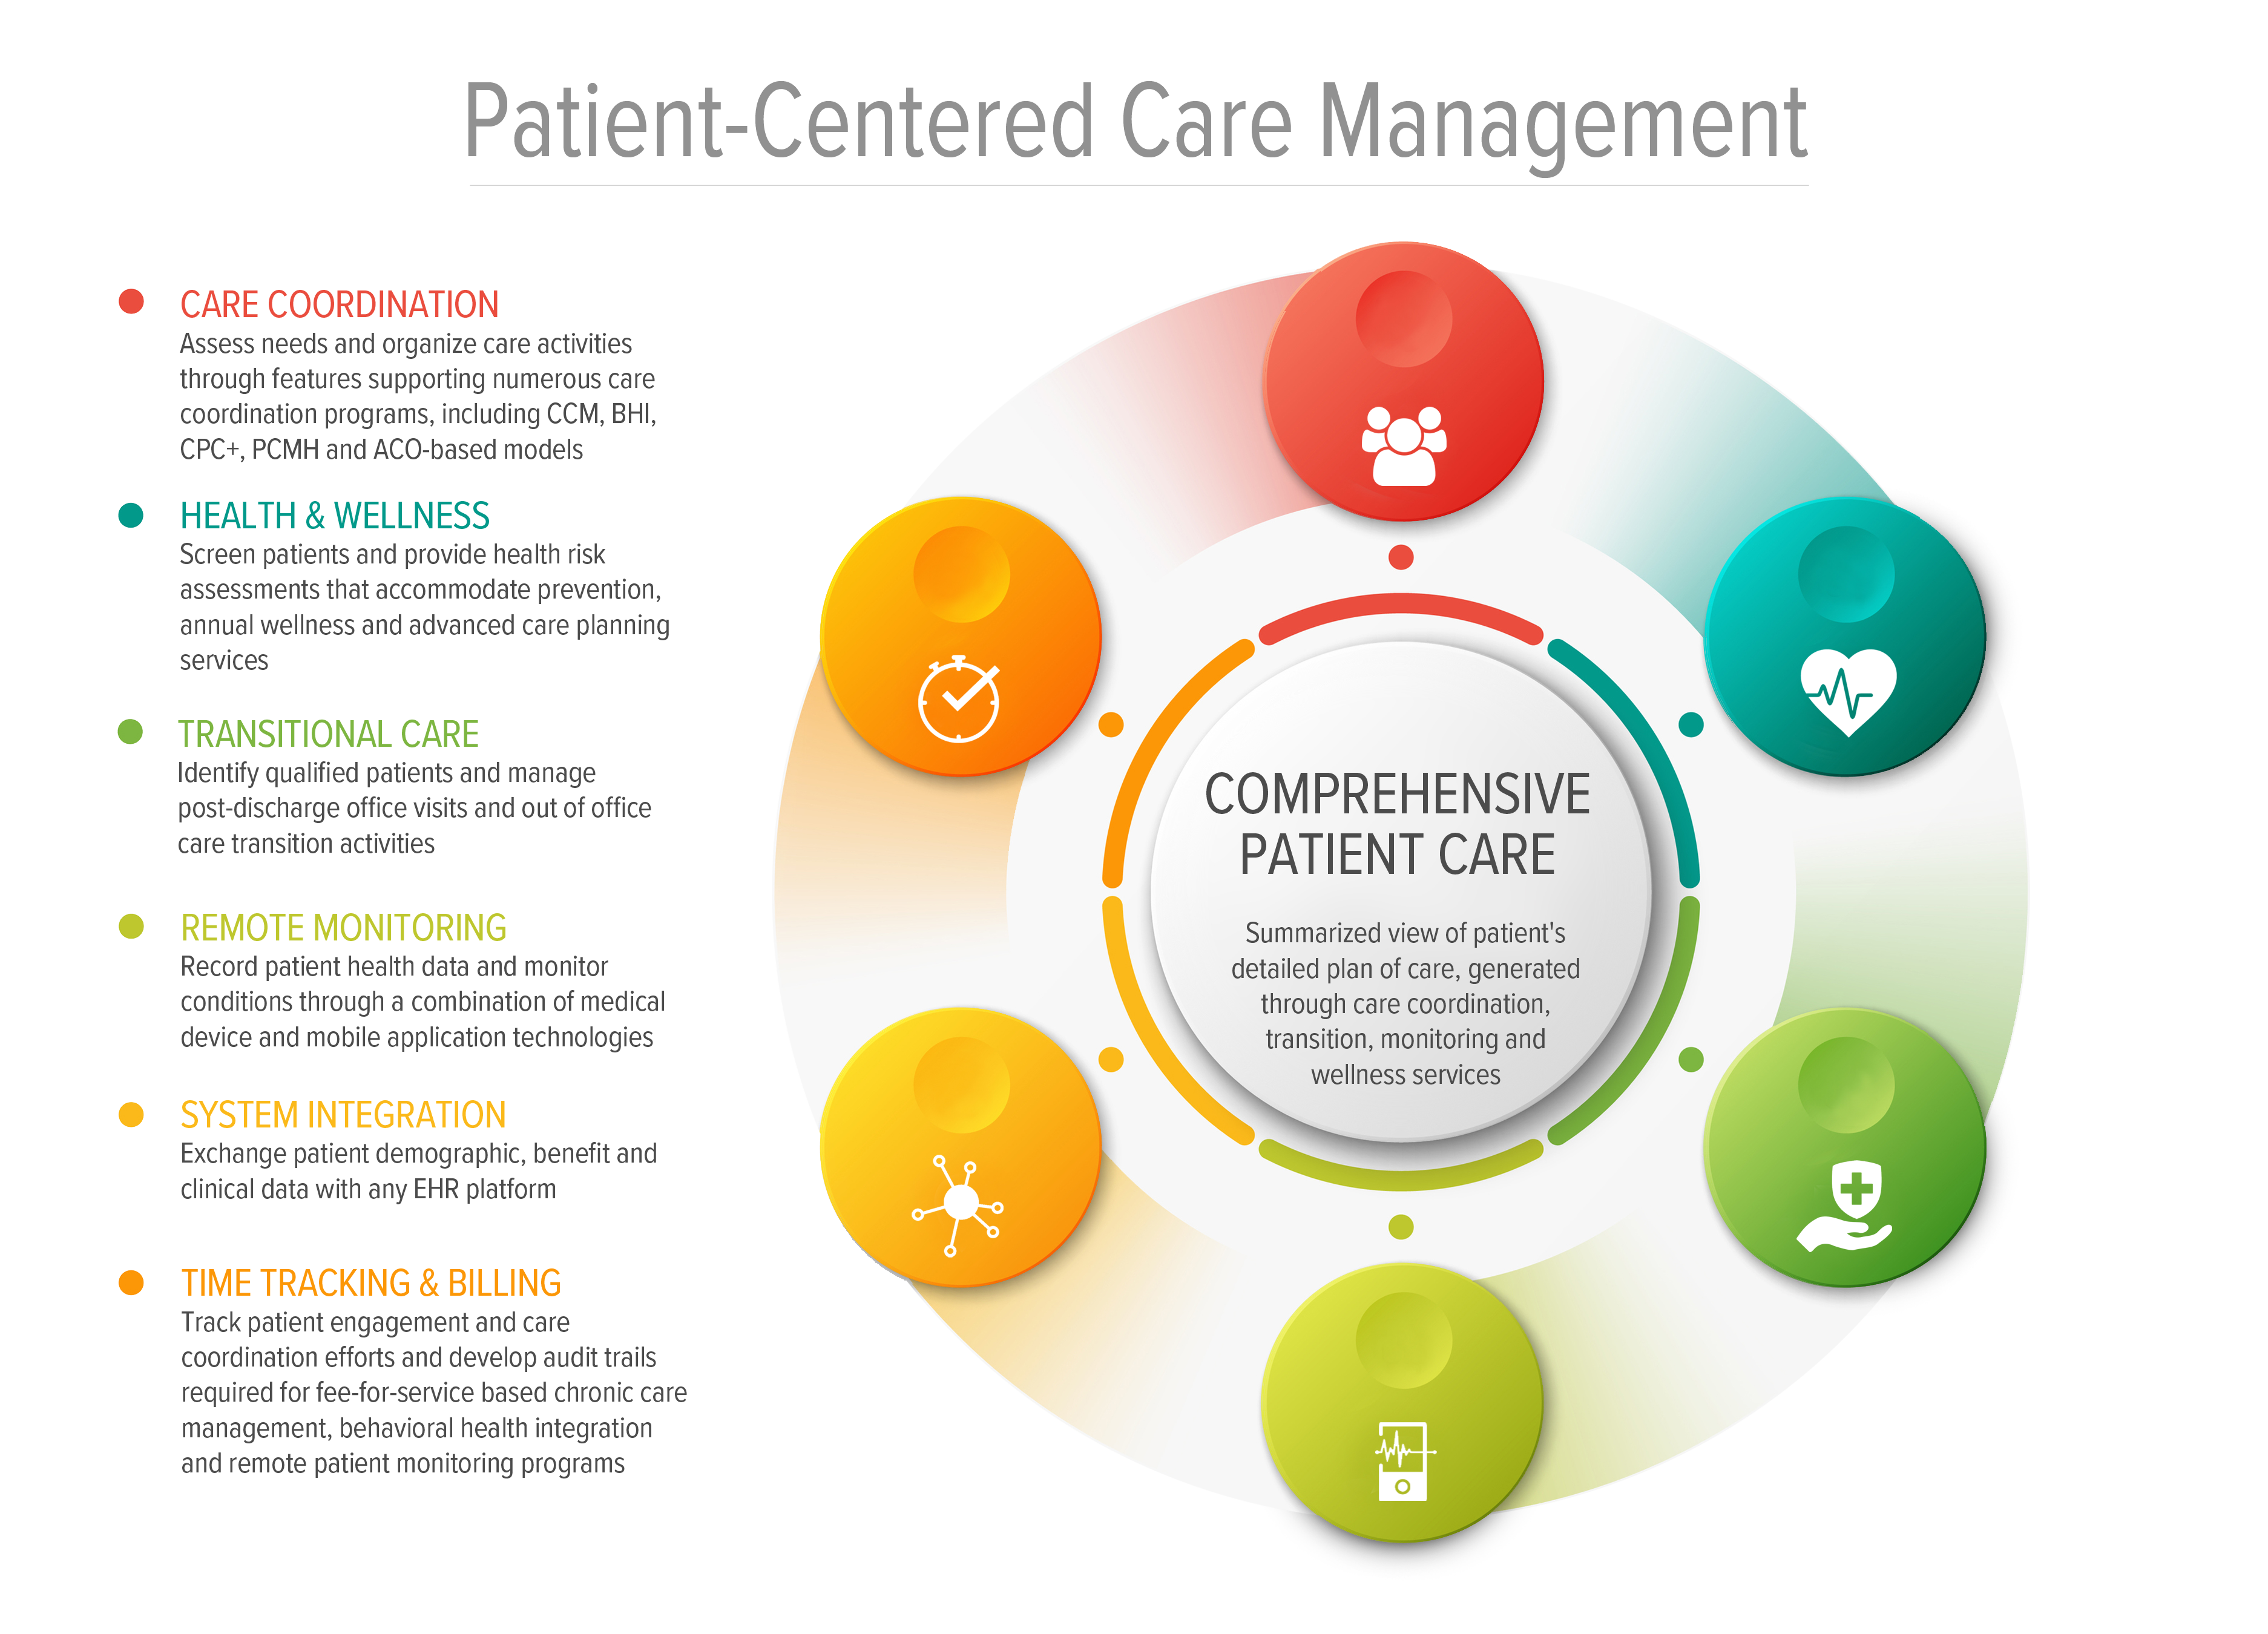 Comprehensive Patient Care